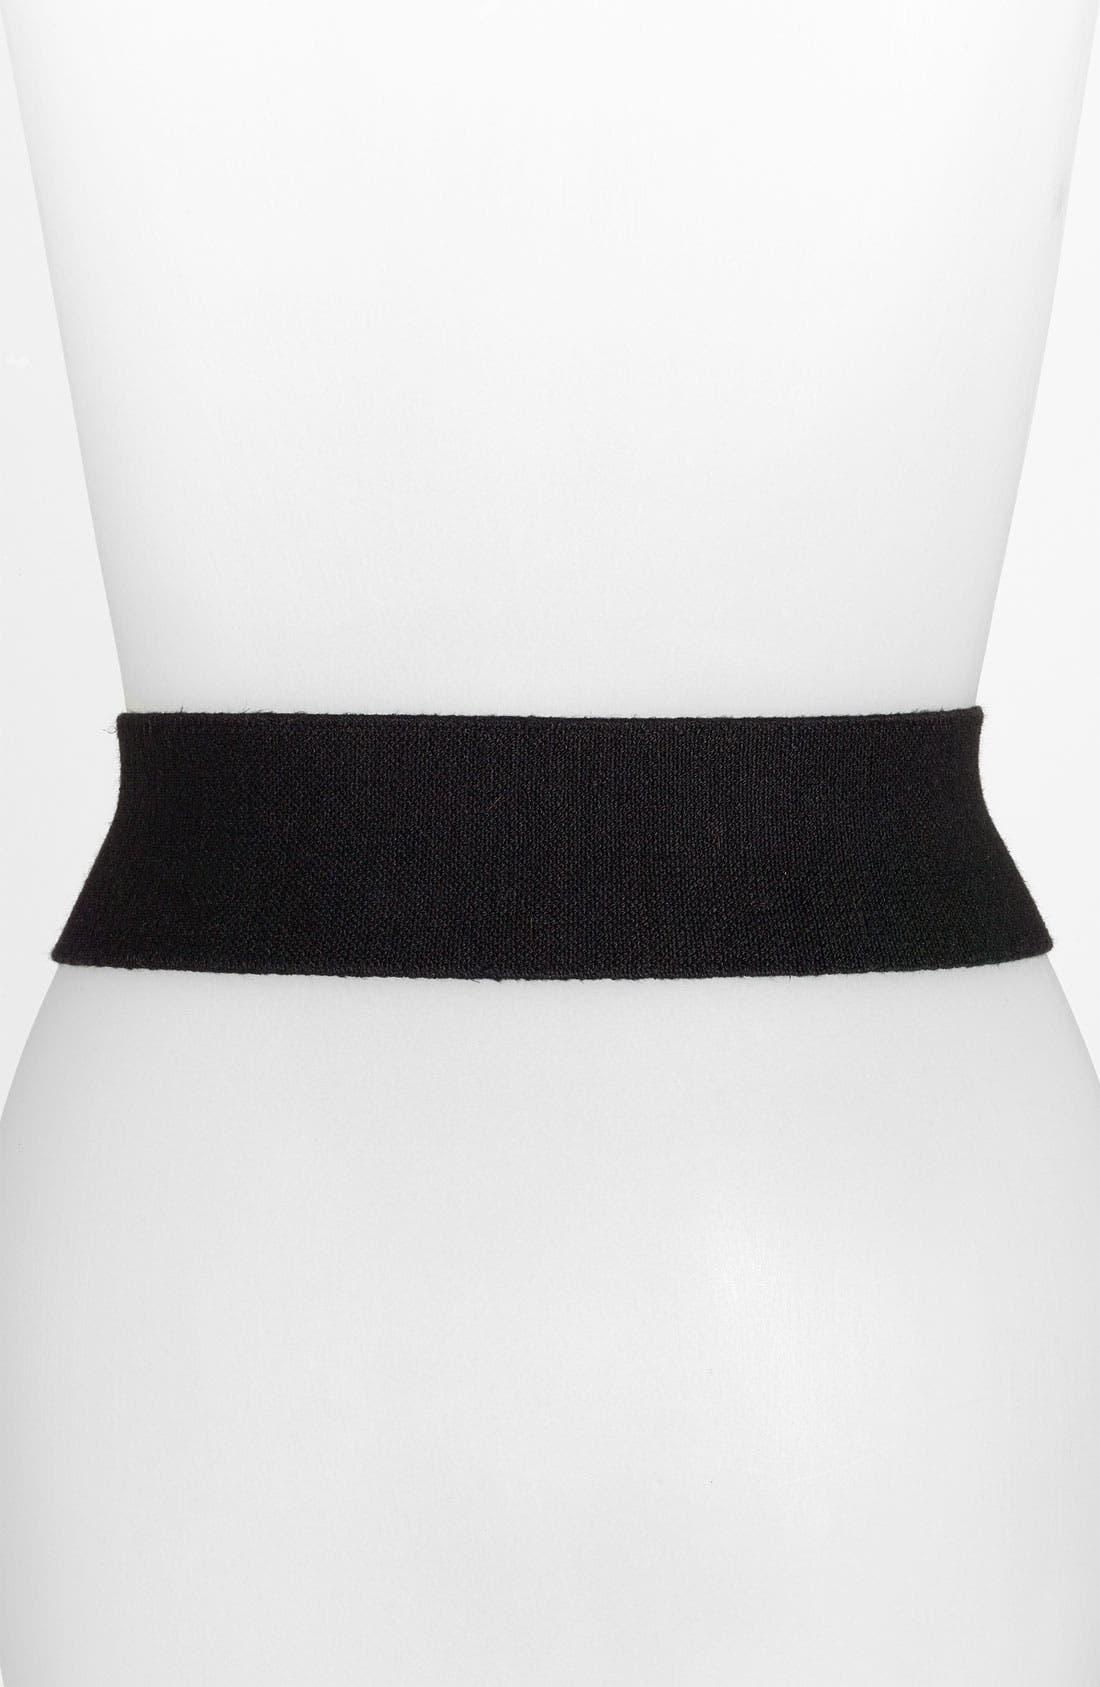 Alternate Image 2  - Tory Burch 'Ellie' Stretch Belt